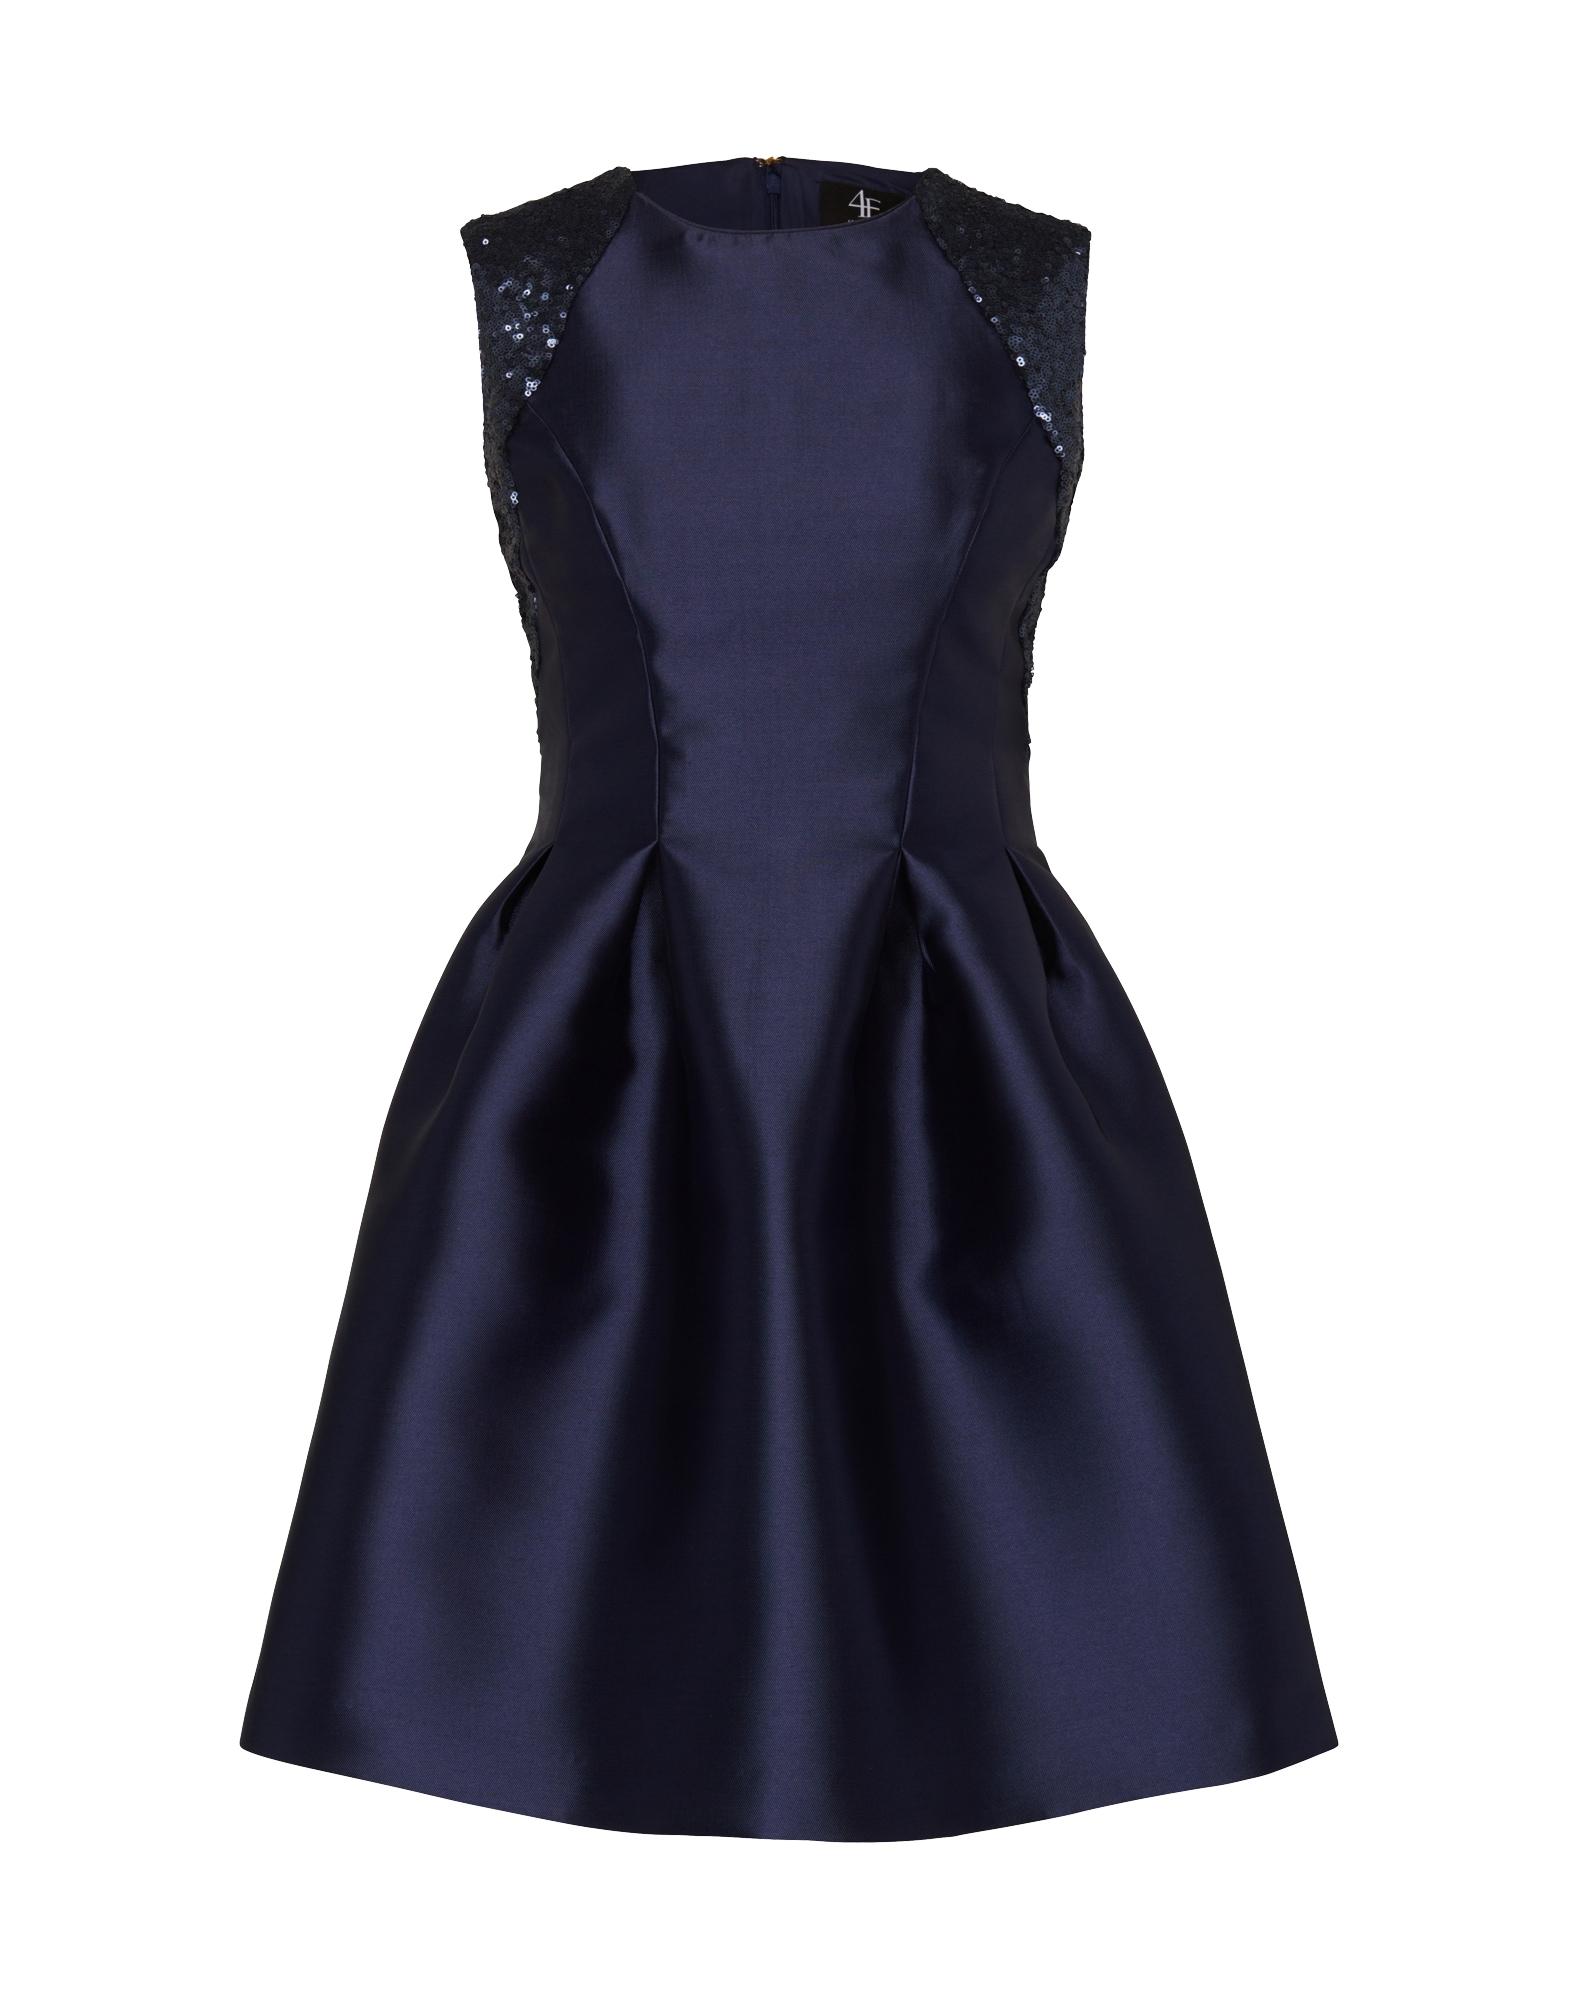 Koktejlové šaty Moa tmavě modrá Four Flavor